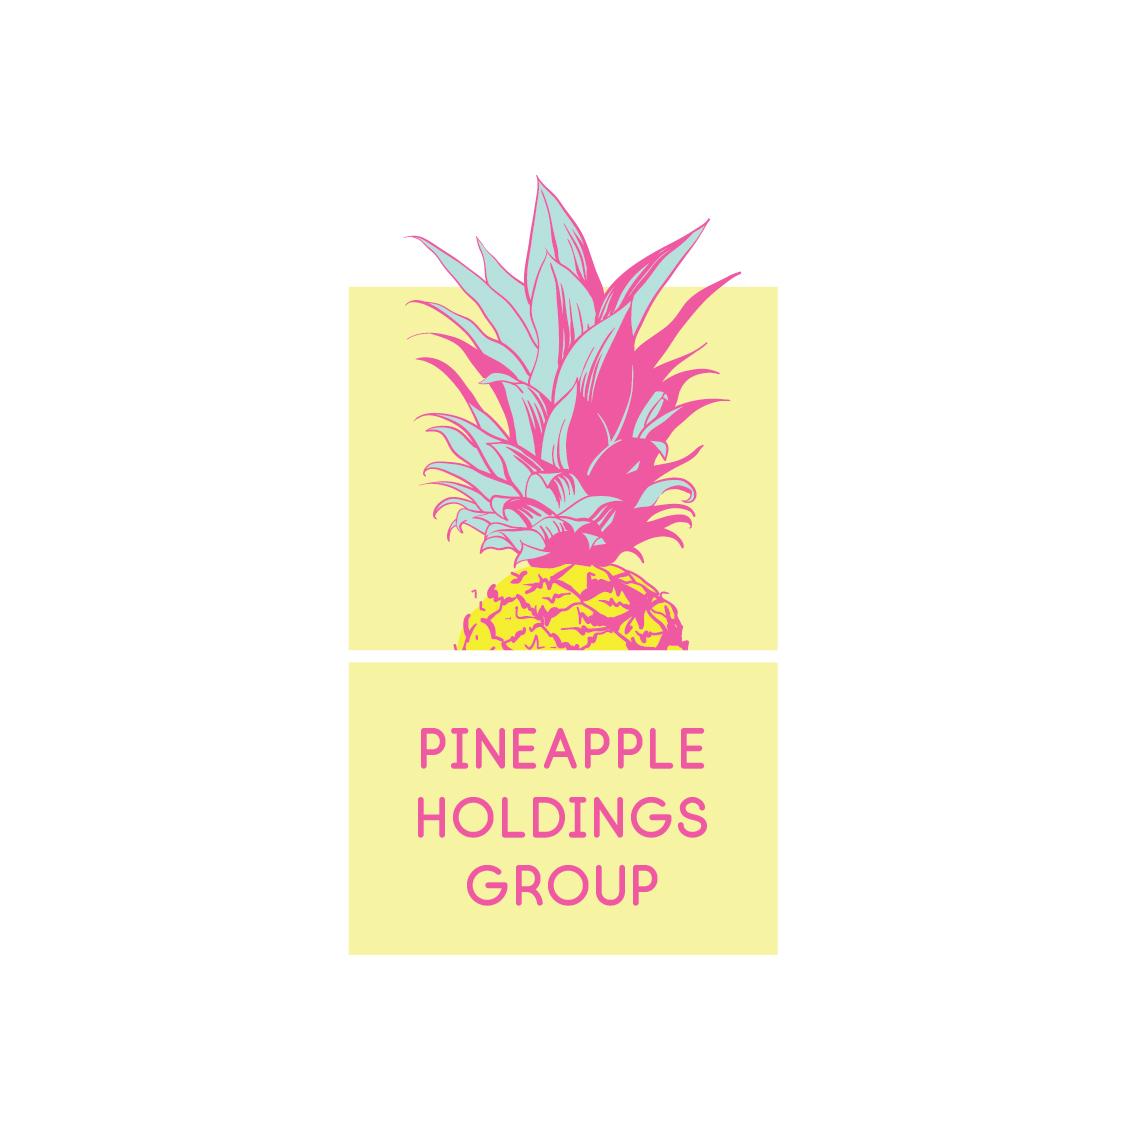 PineappleHoldingsGroup_BizCard_FINAL-01 copy.jpg